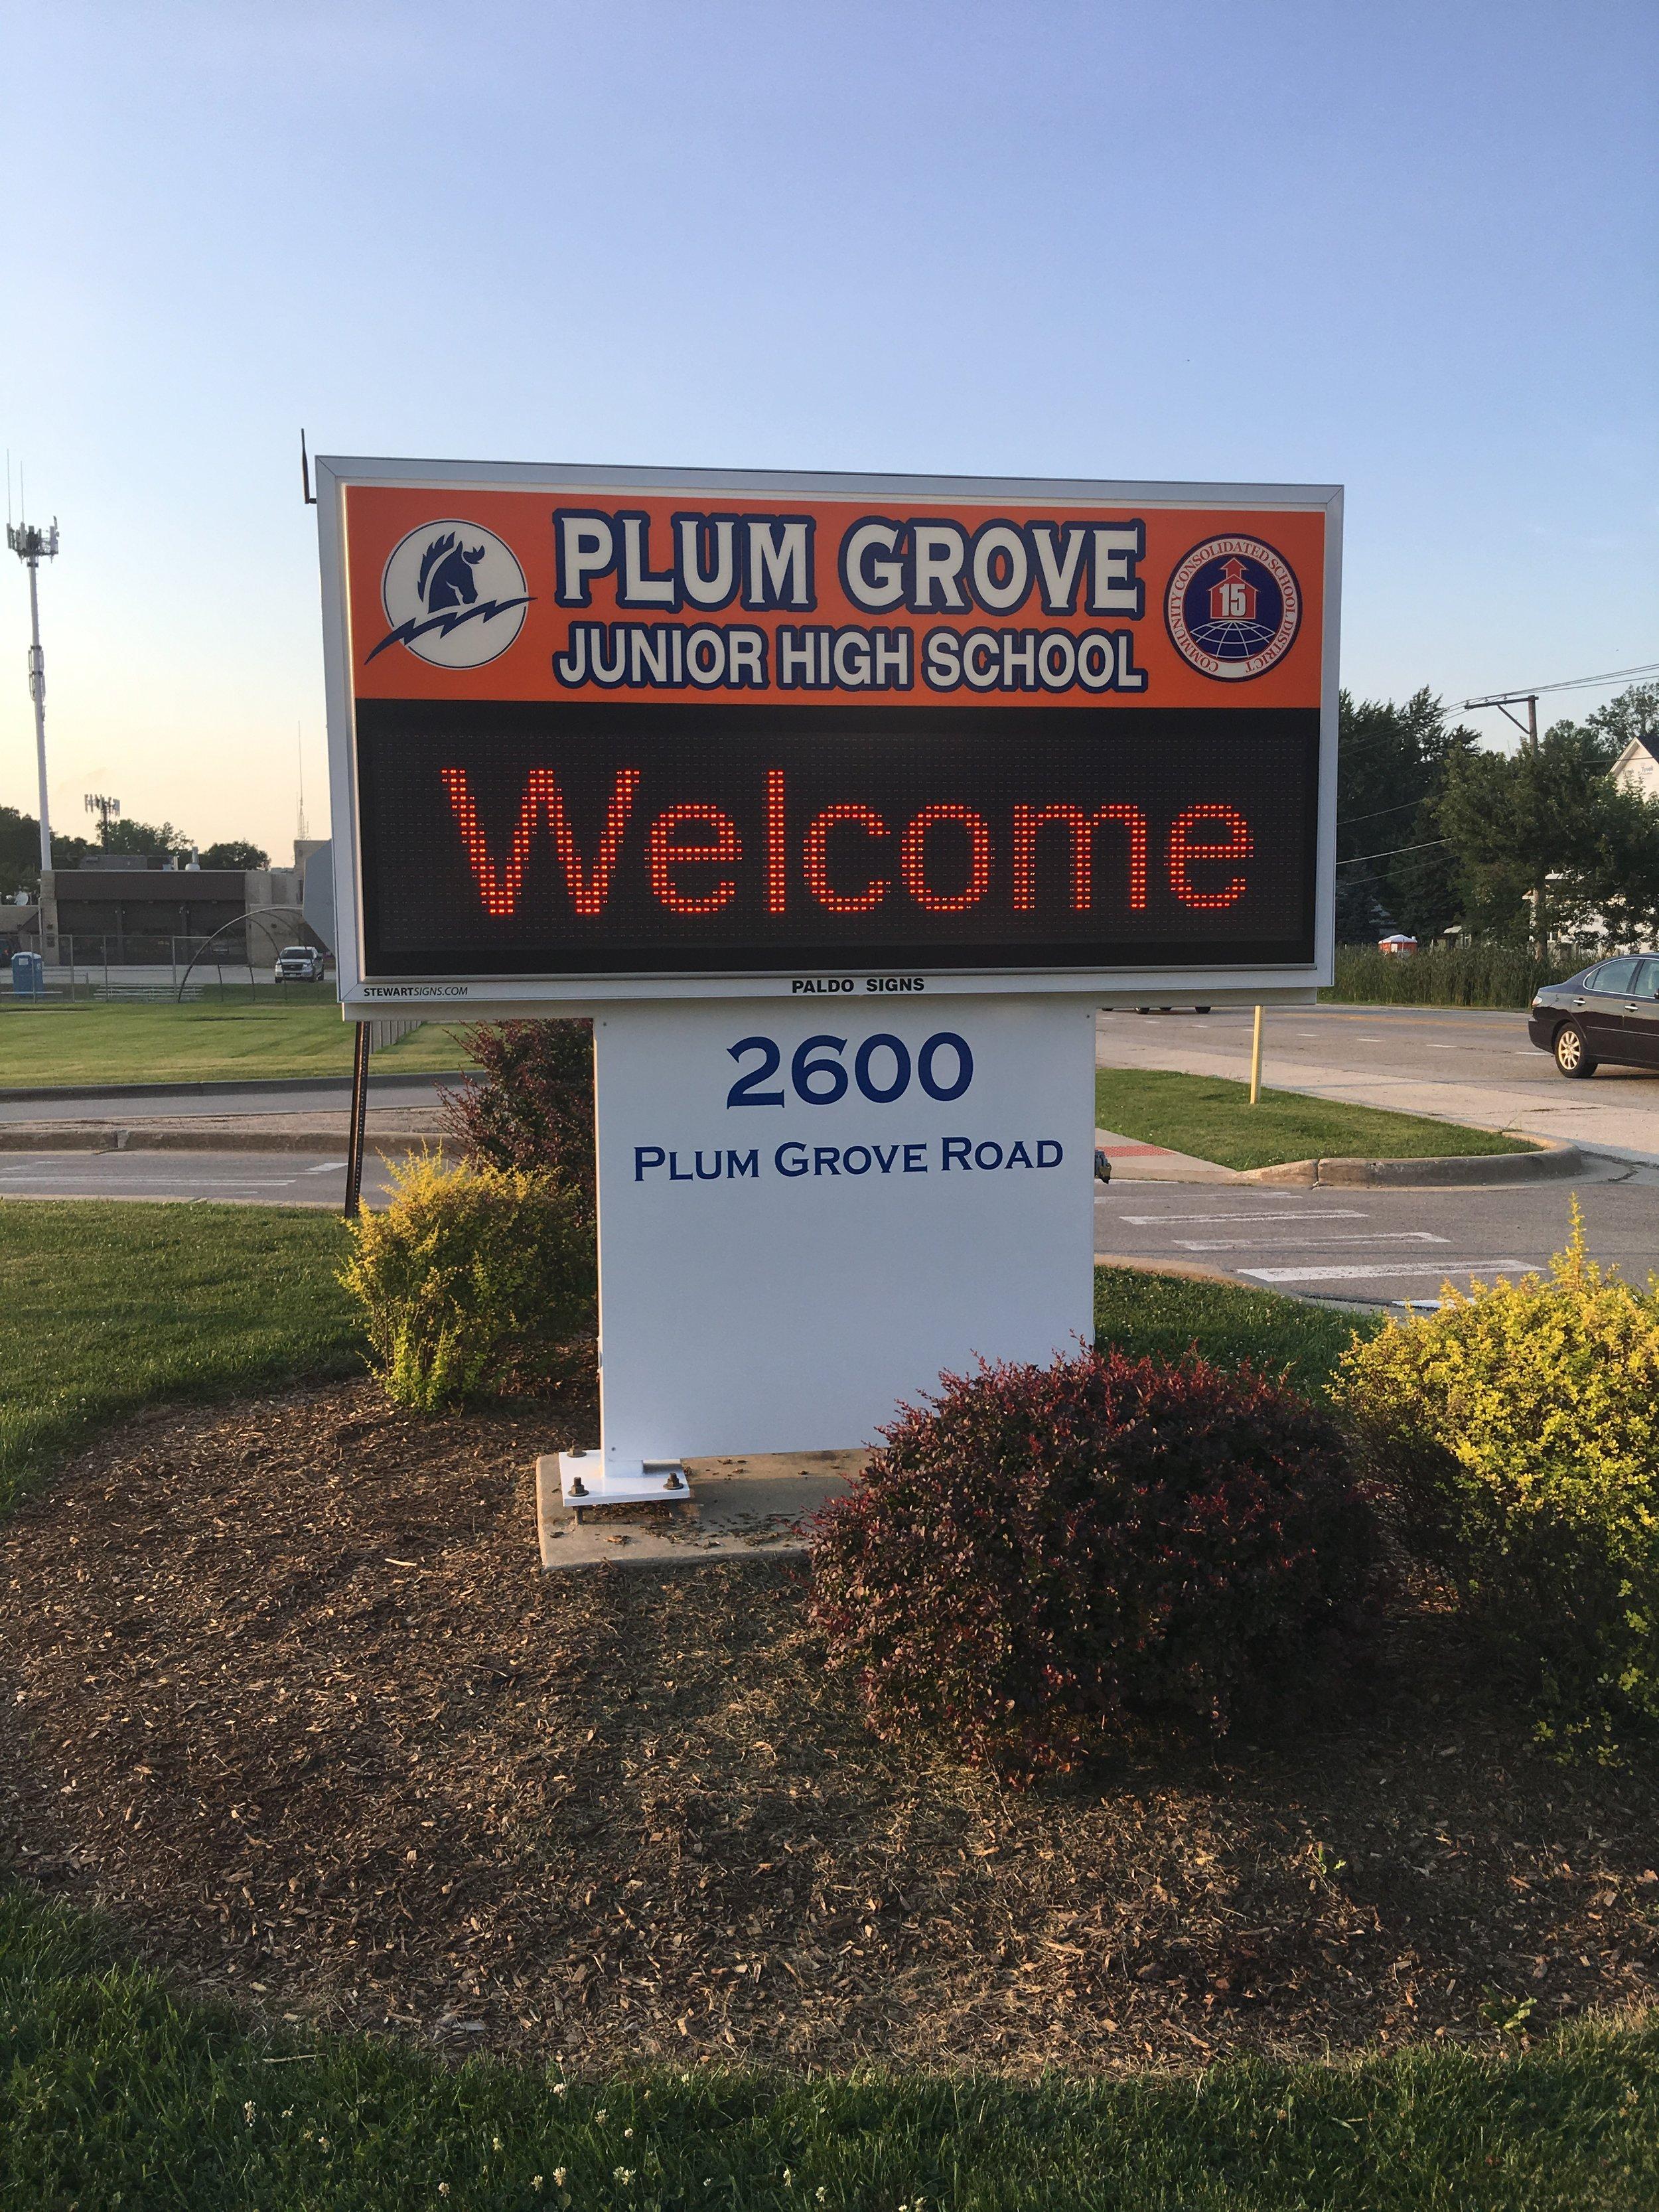 Plum Grove